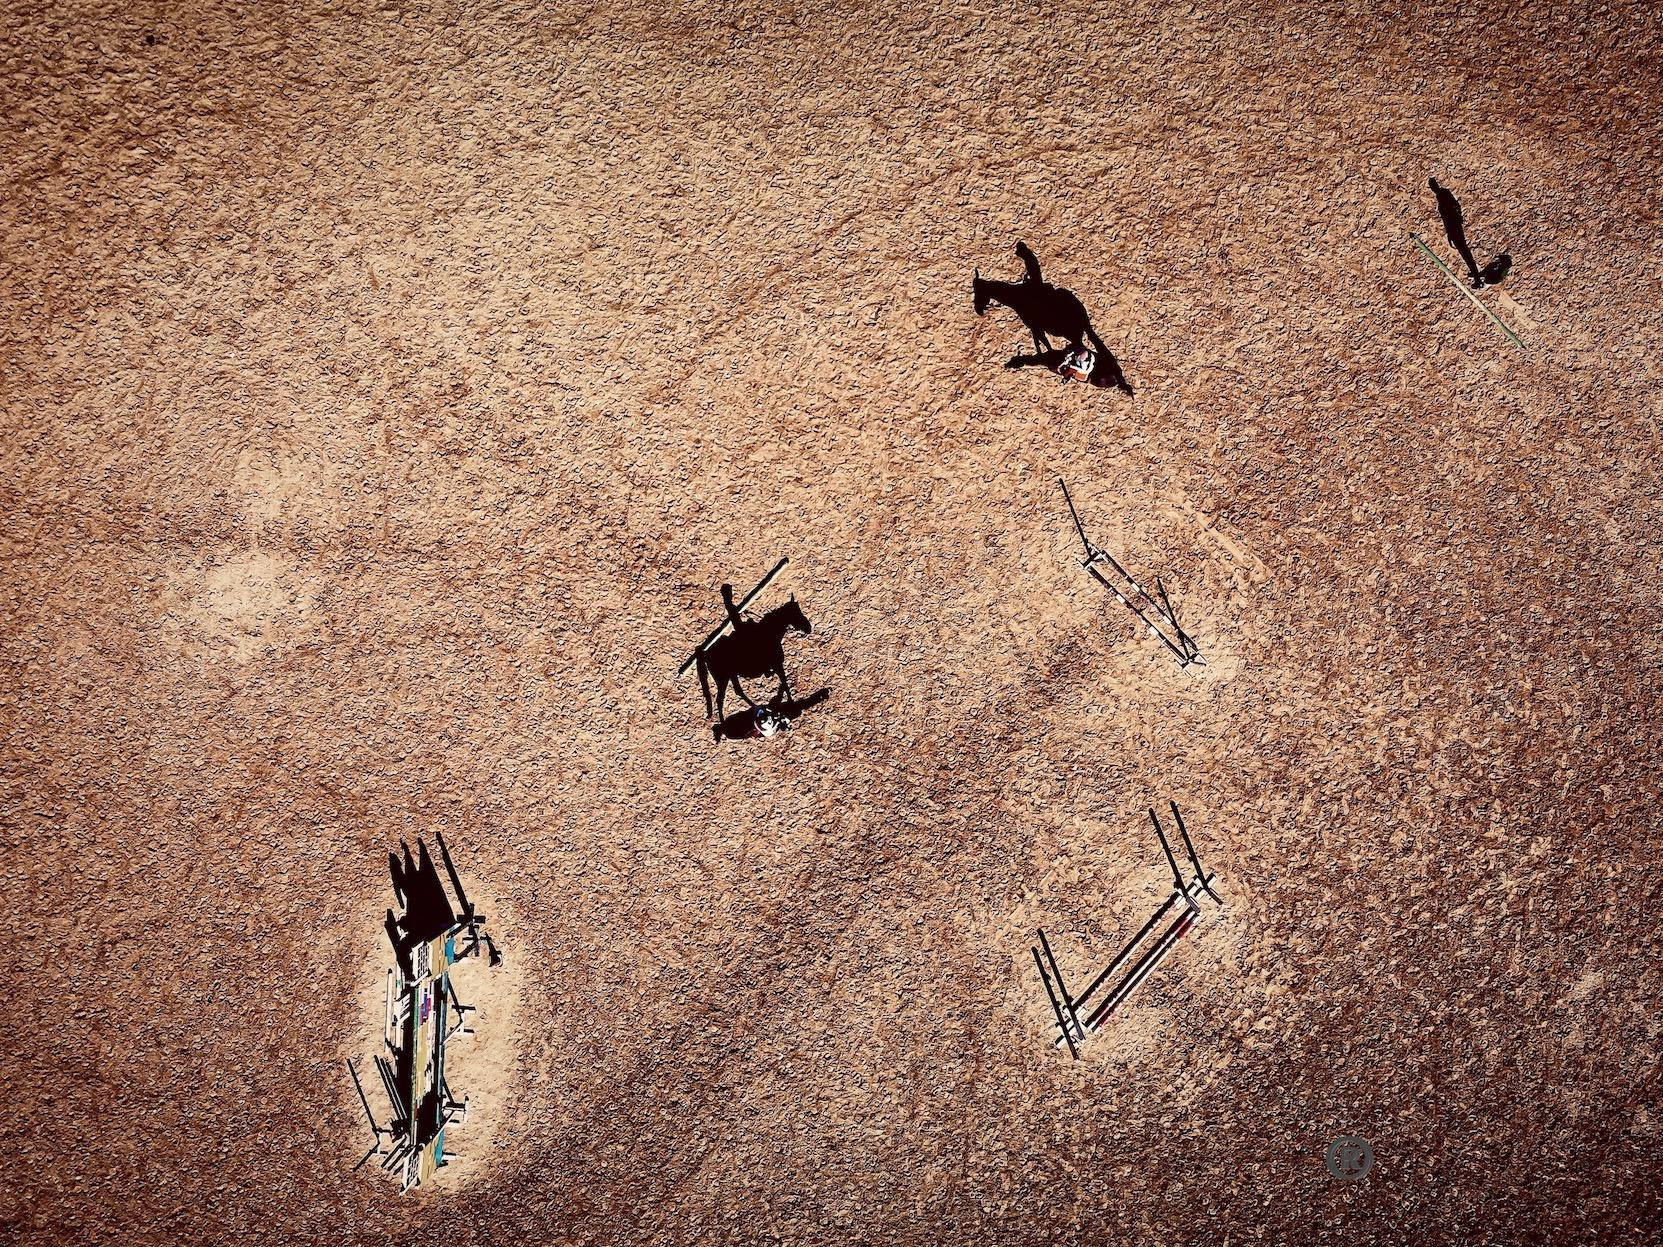 HORSE DJI.jpeg